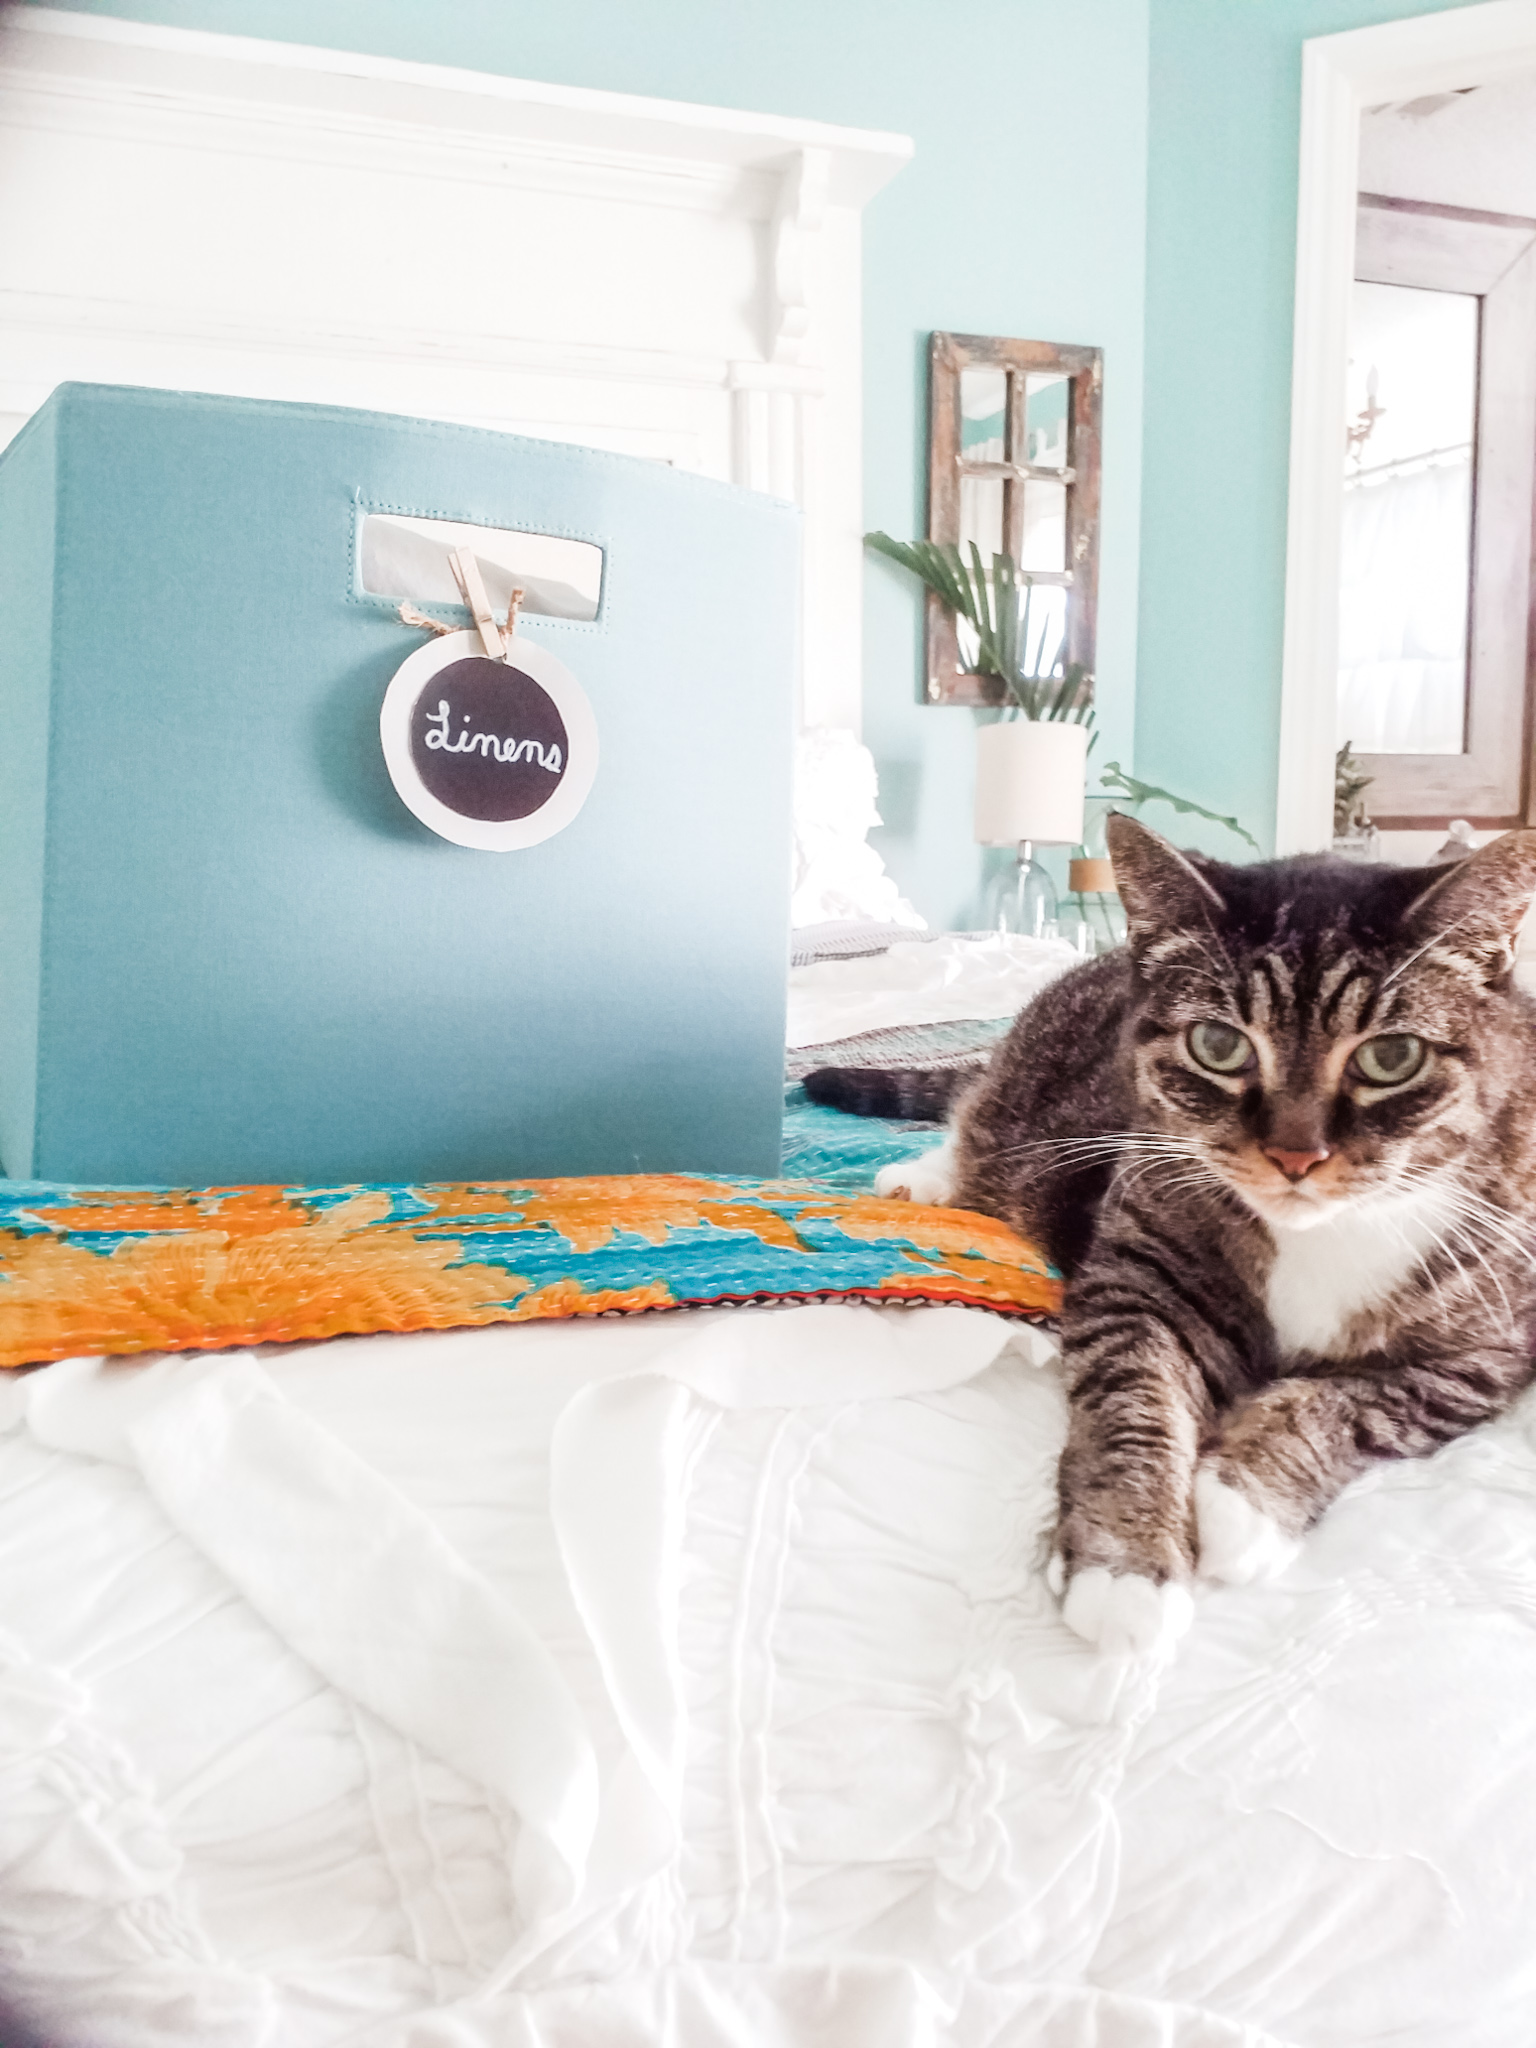 organizing linens and cat.jpg